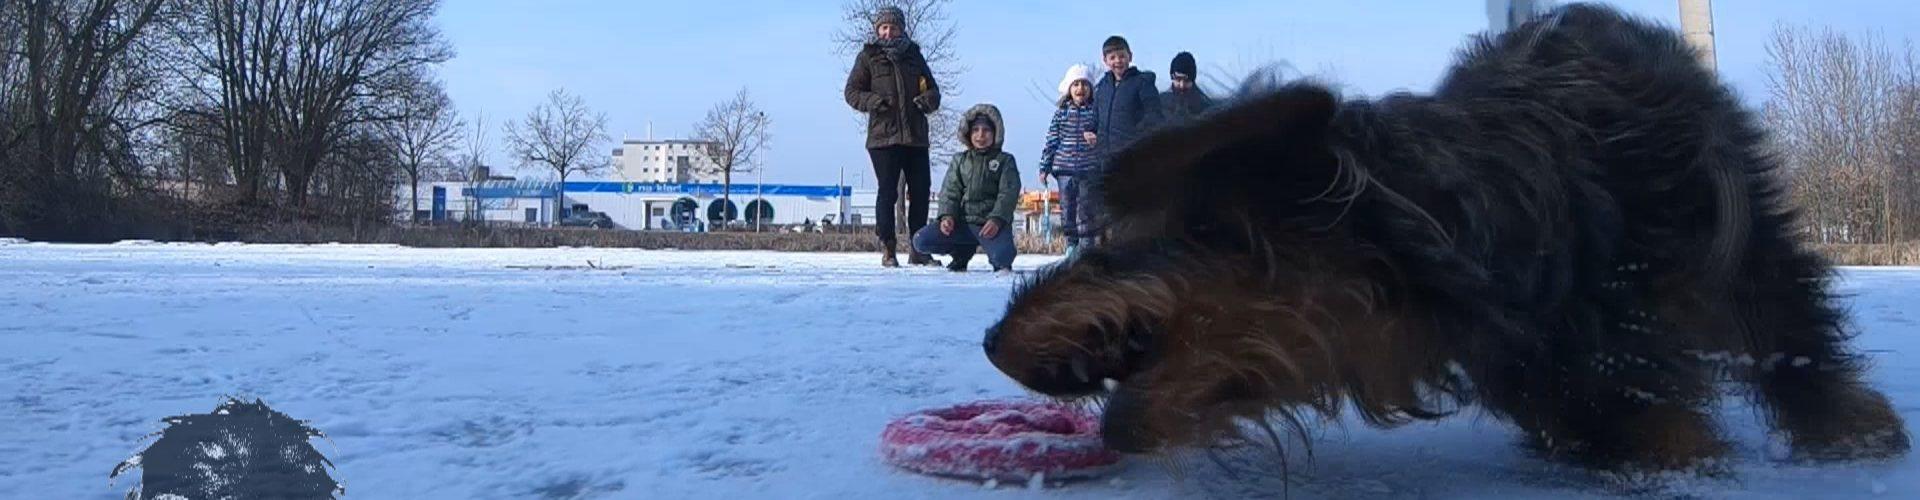 Frytka on the ice Slow Motion